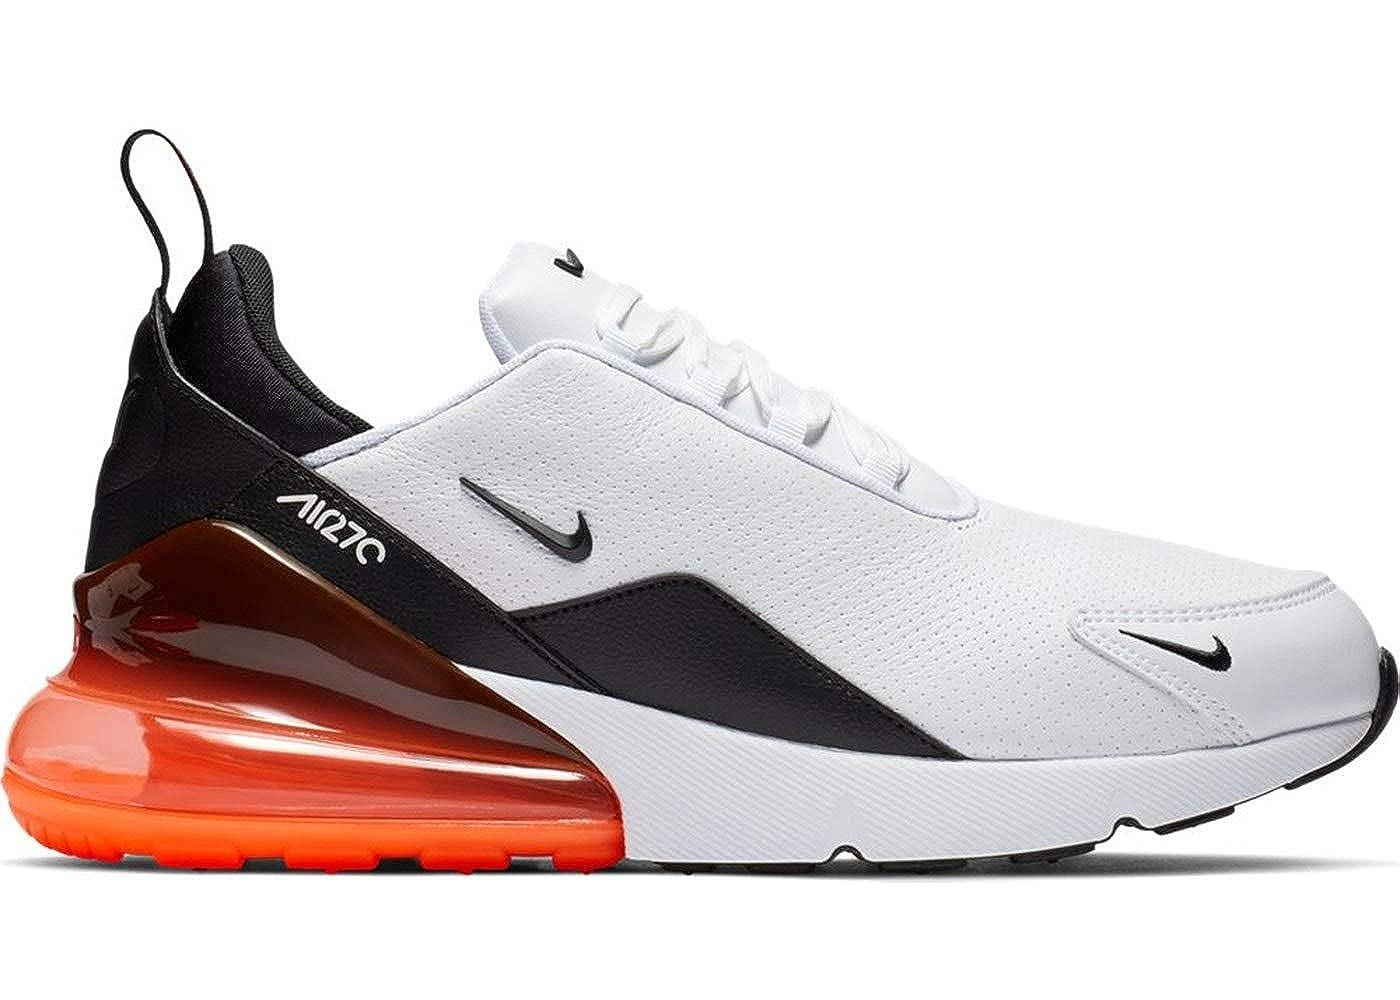 Nike Air Max 270 Premium Leather Men s Running Shoes BQ6171